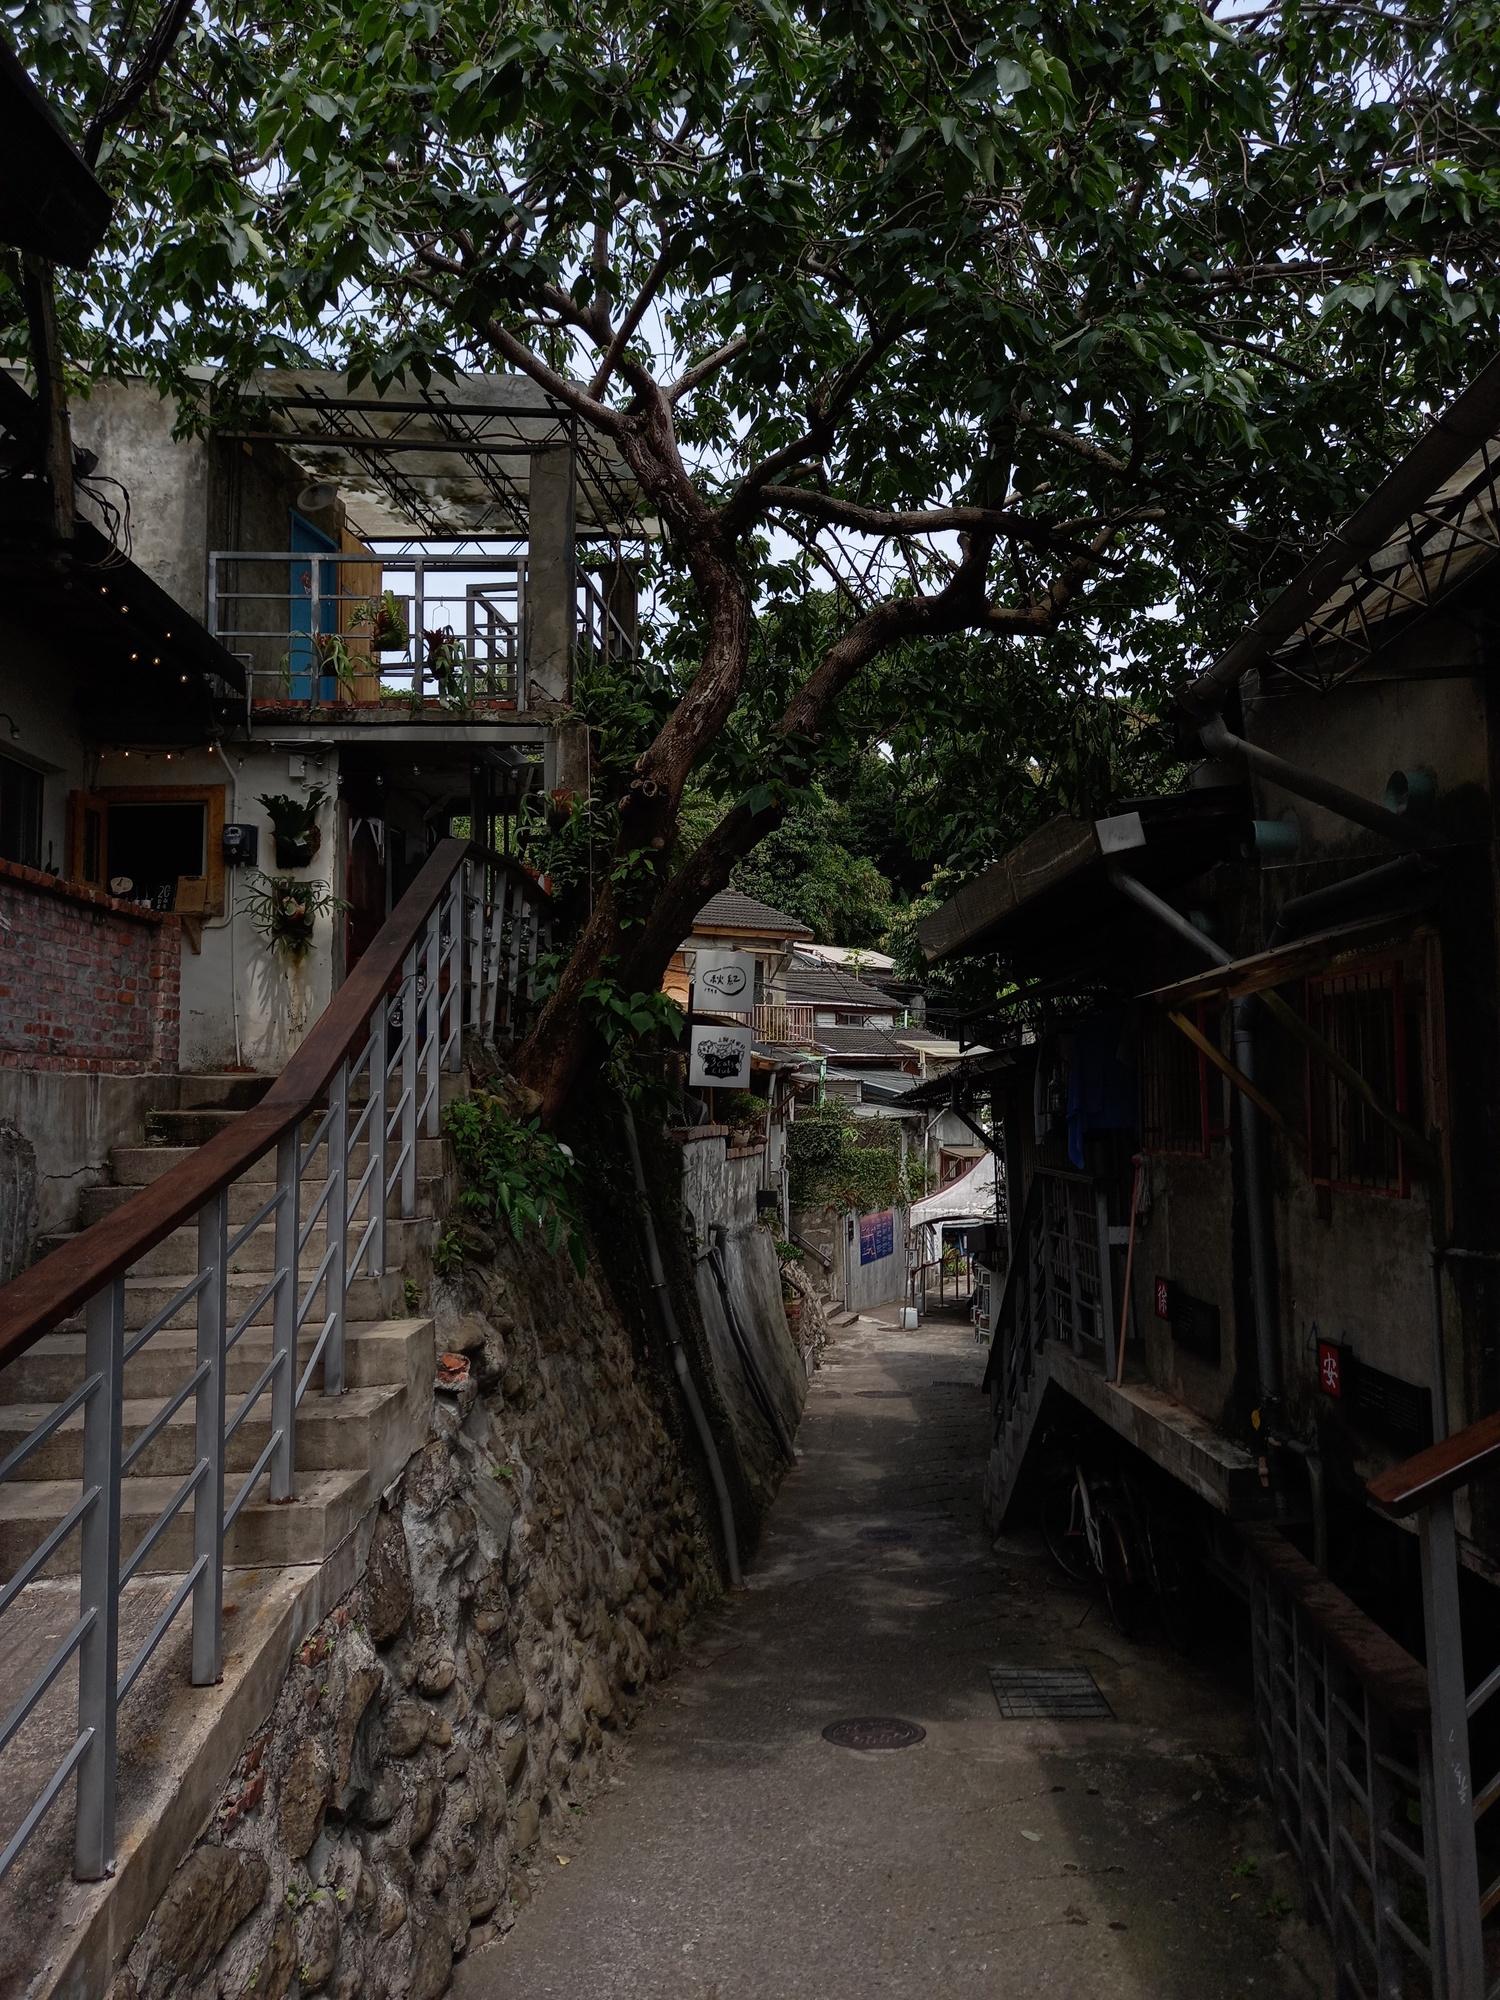 Treasure Hill Alleys, Nooks and Crannies